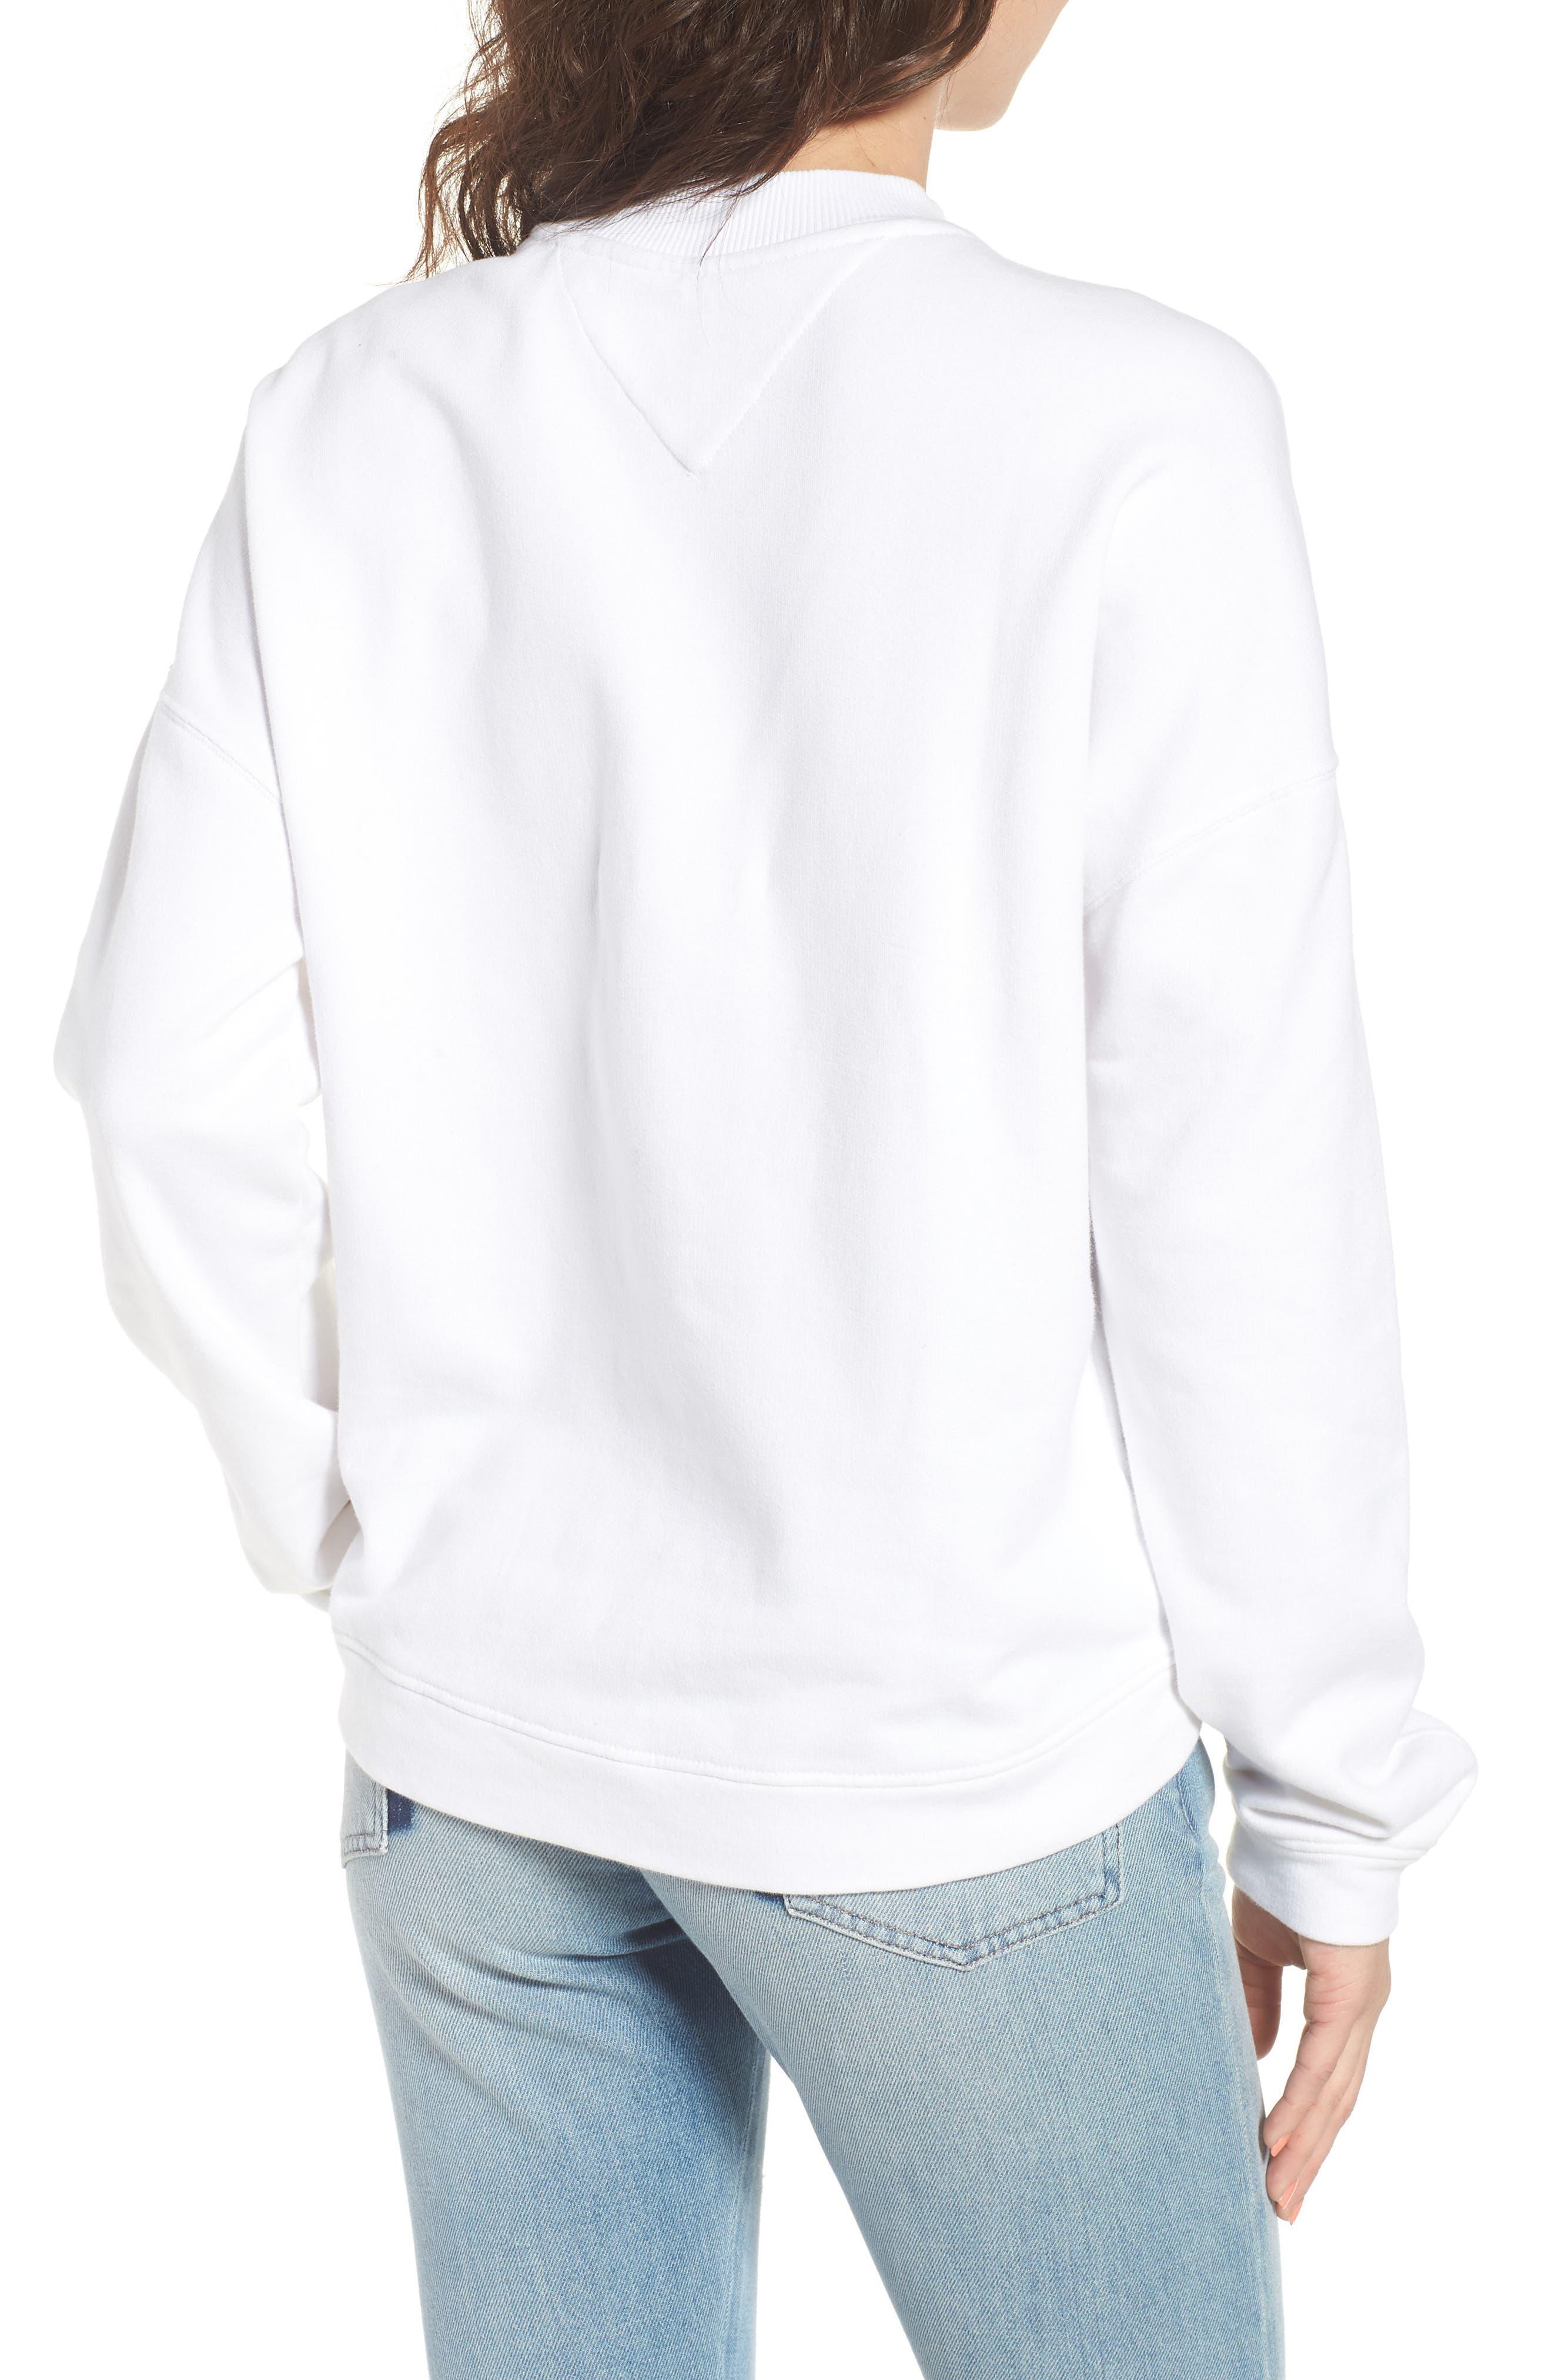 Race Uniform Badge Sweatshirt,                             Alternate thumbnail 2, color,                             Bright White